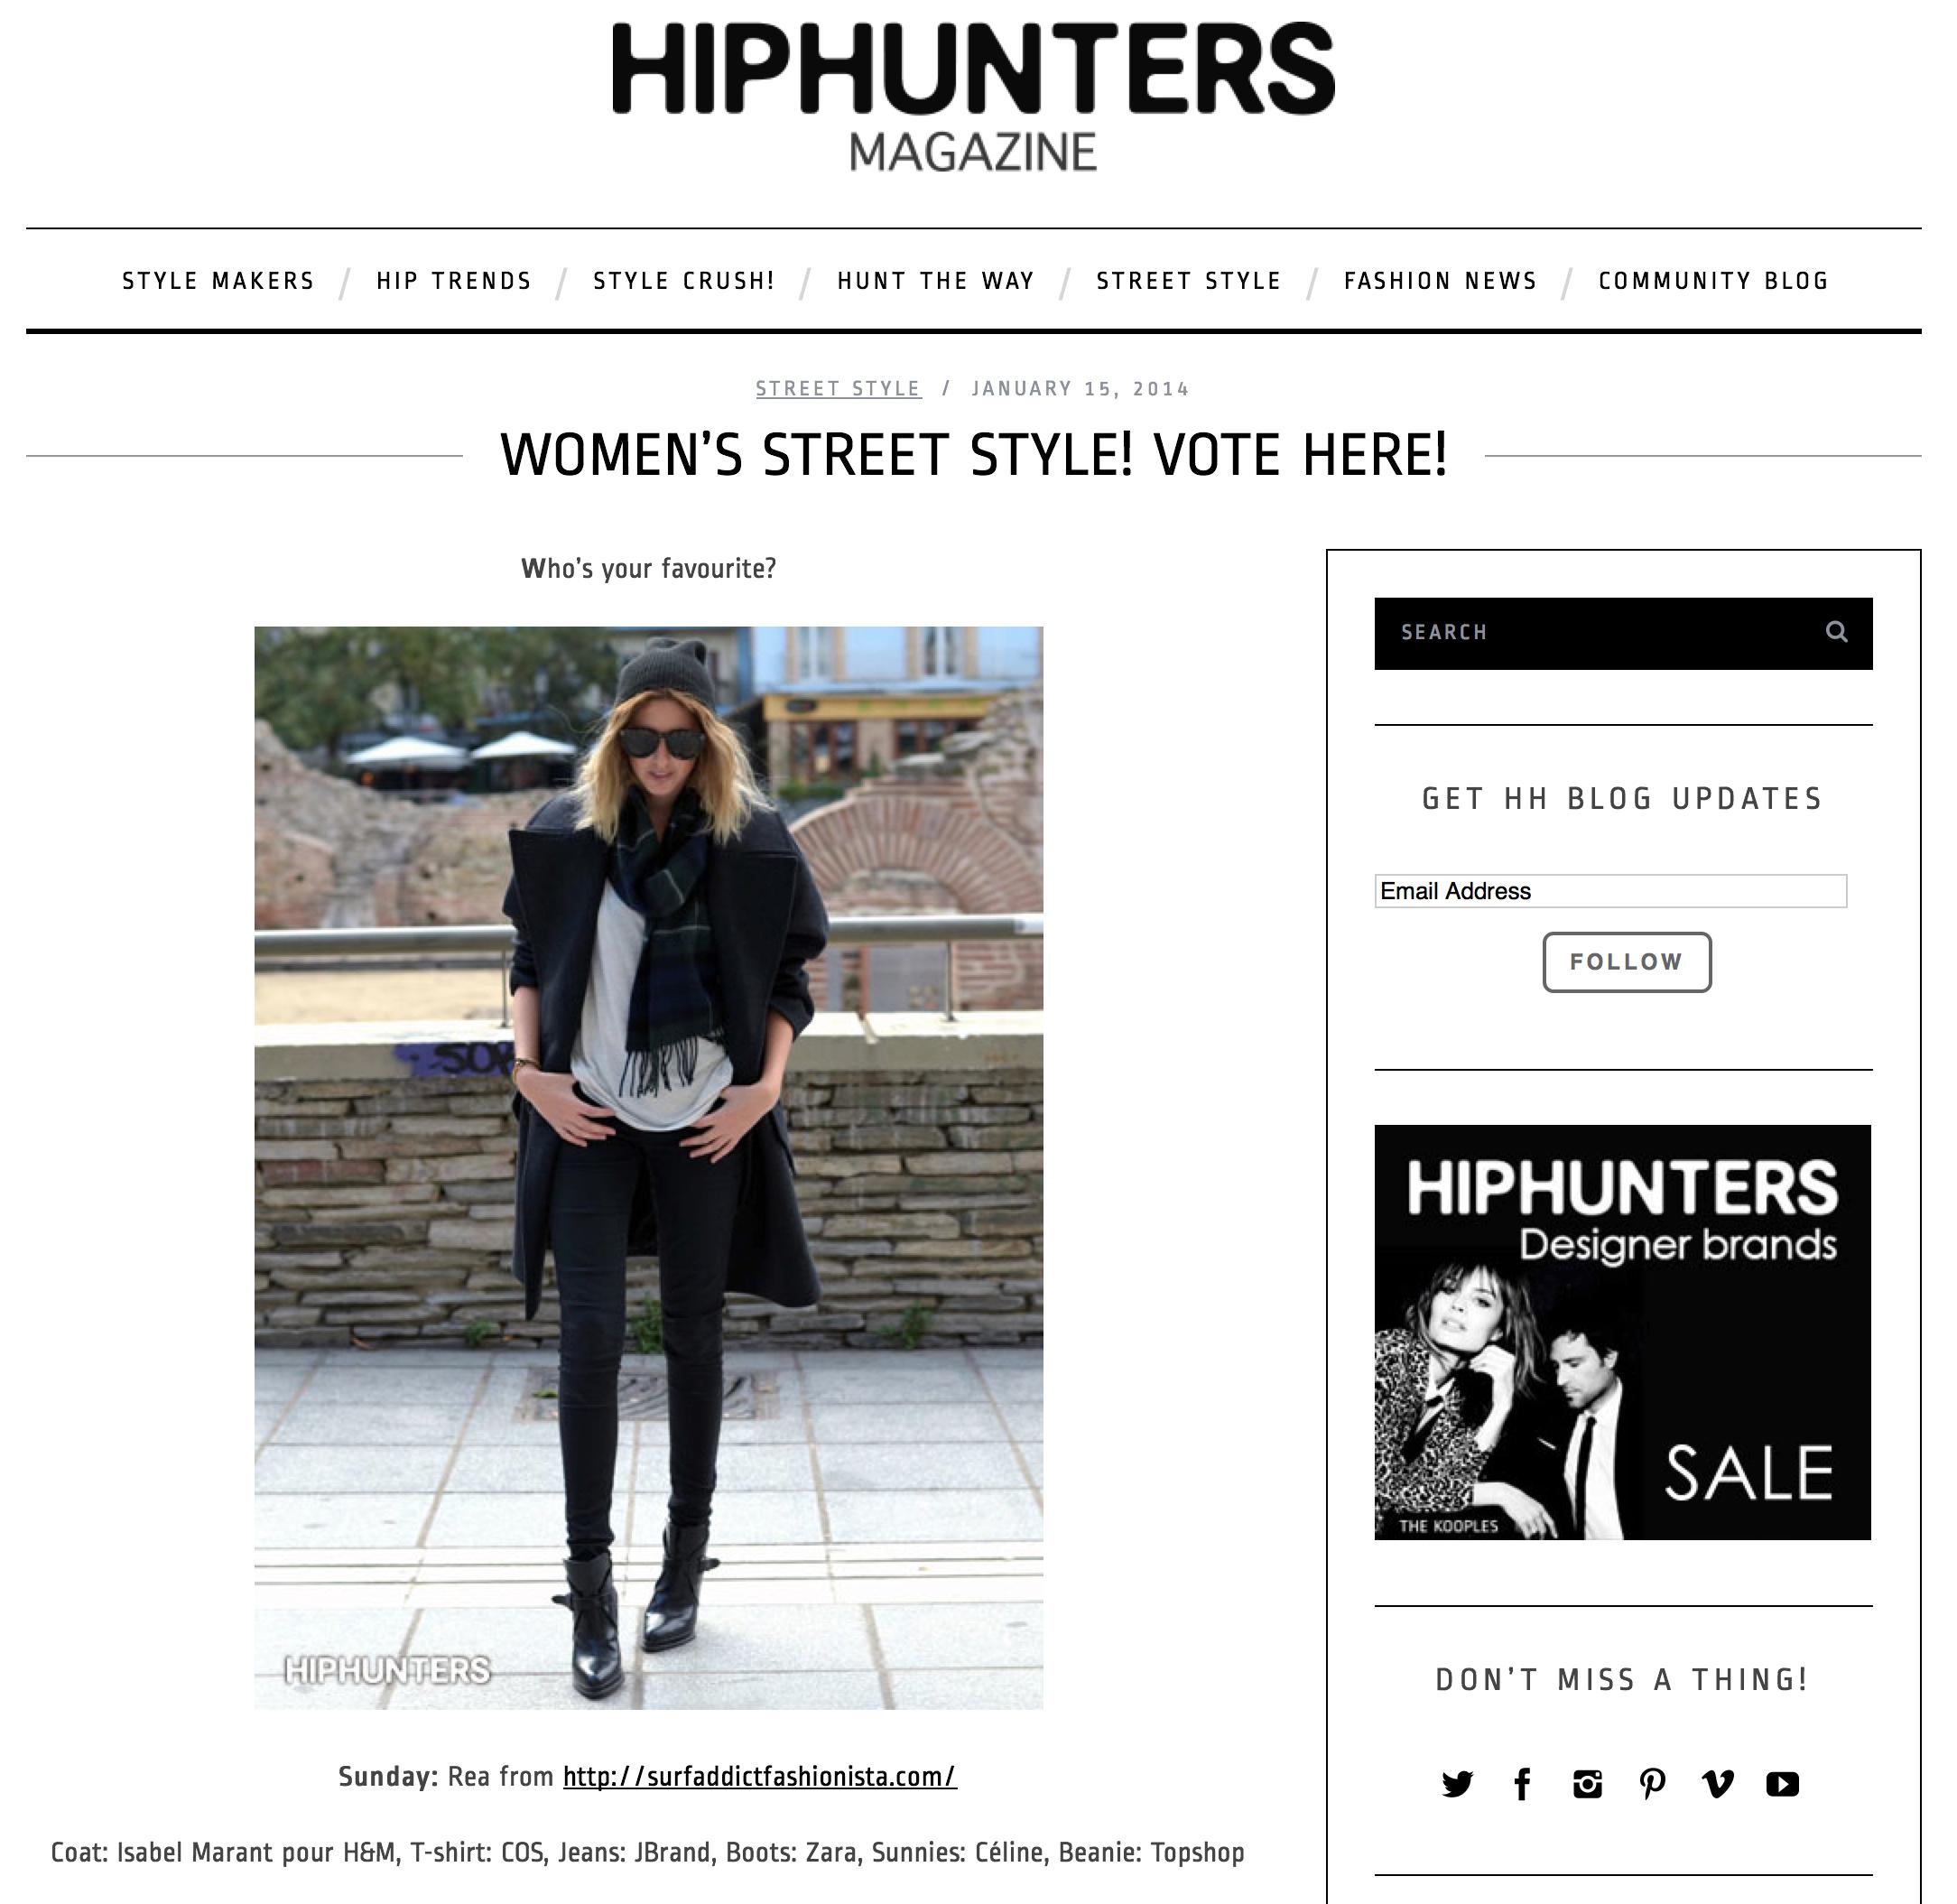 http---www.hiphunters.com-magazine-2014-01-15-womens-street-style-vote-17-(20140205).jpg